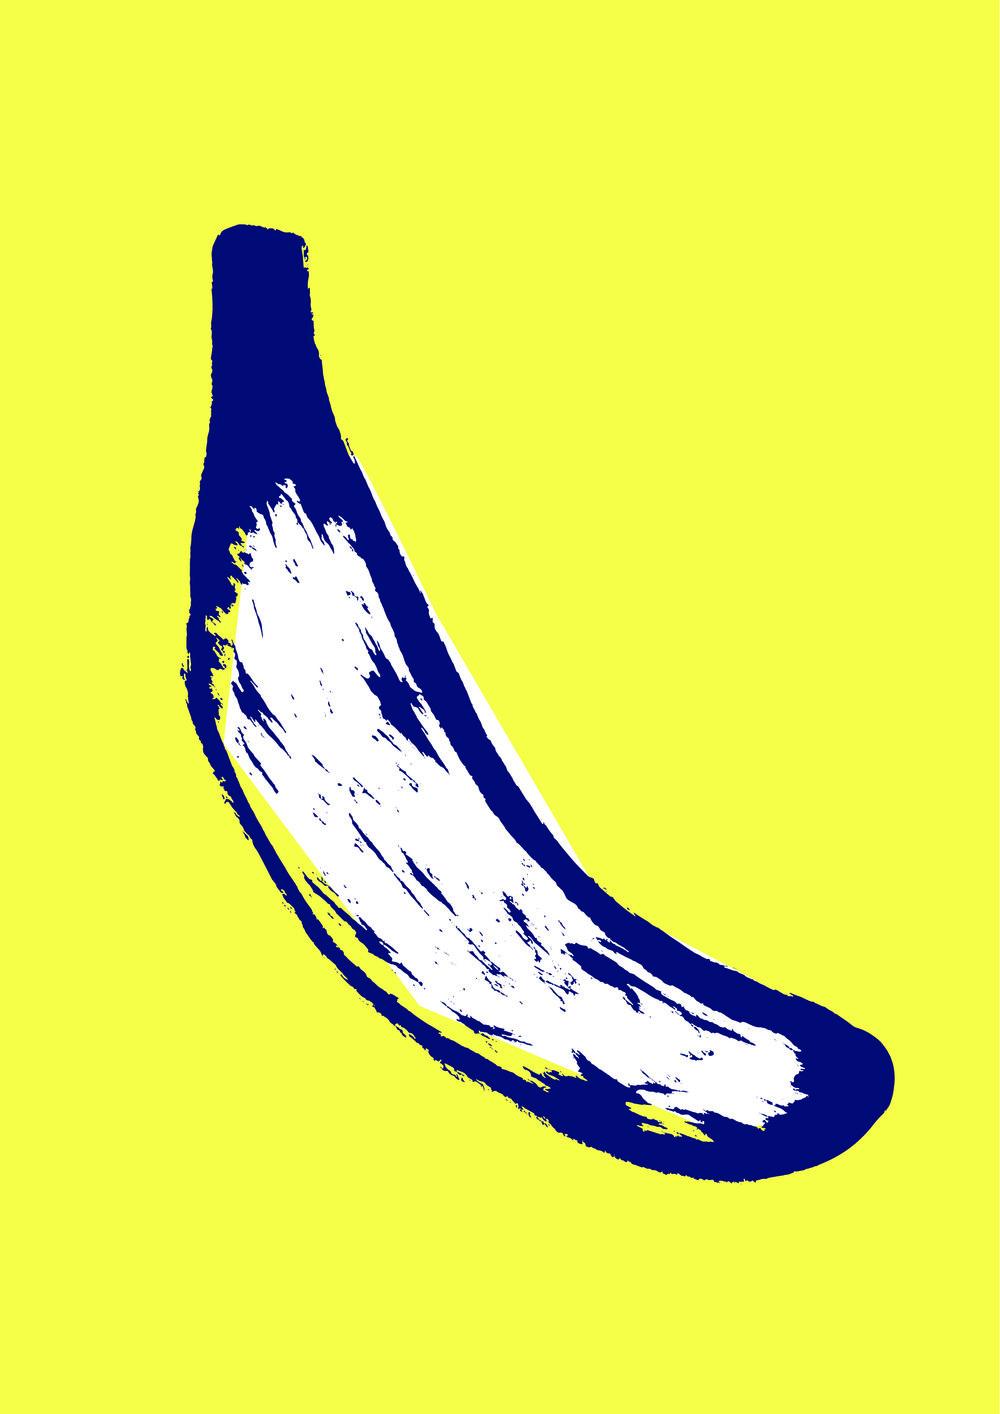 banana-thumbnail-02.jpg